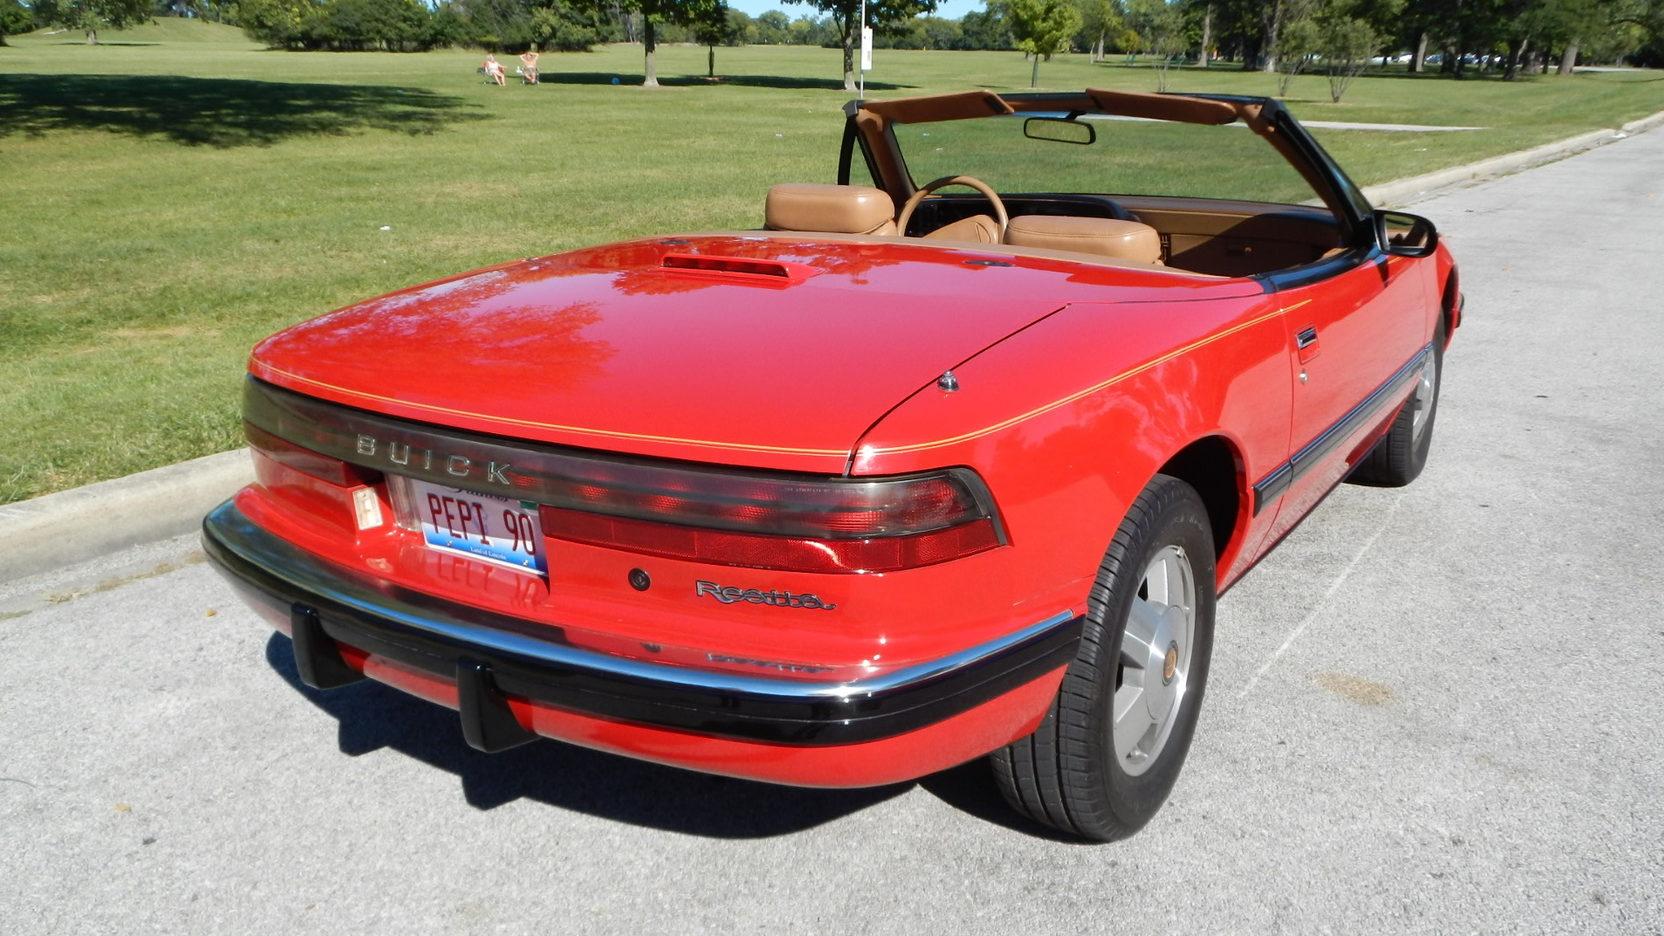 medium resolution of 1990 buick reatta convertible f55 1 chicago 20161990 buick reatta convertible 3 full screen st mecum auctions reatta wiring diagram